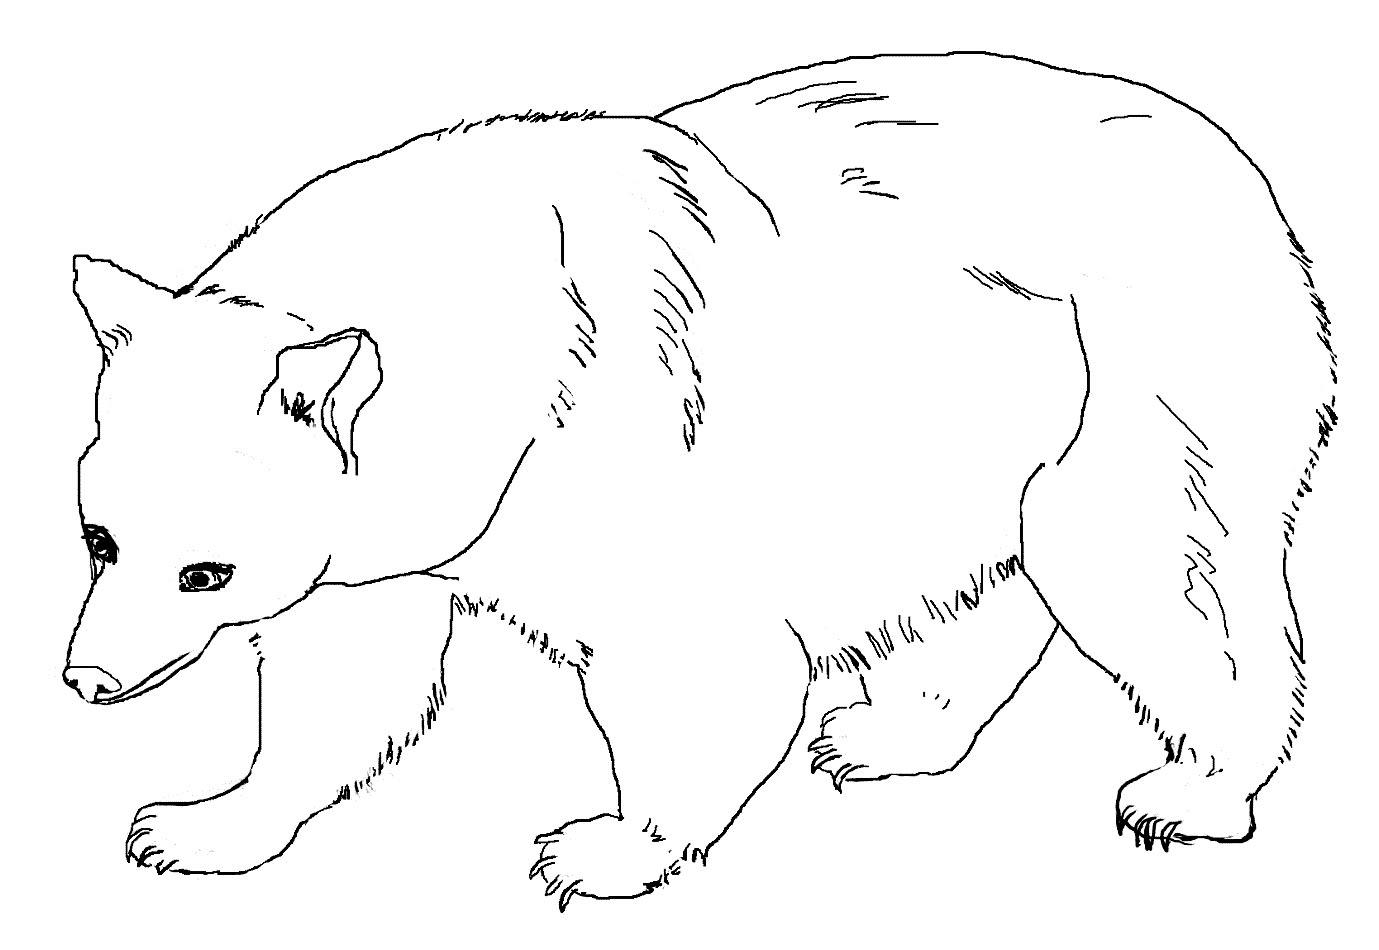 Gambar Mewarnai Beruang Untuk Anak PAUD dan TK